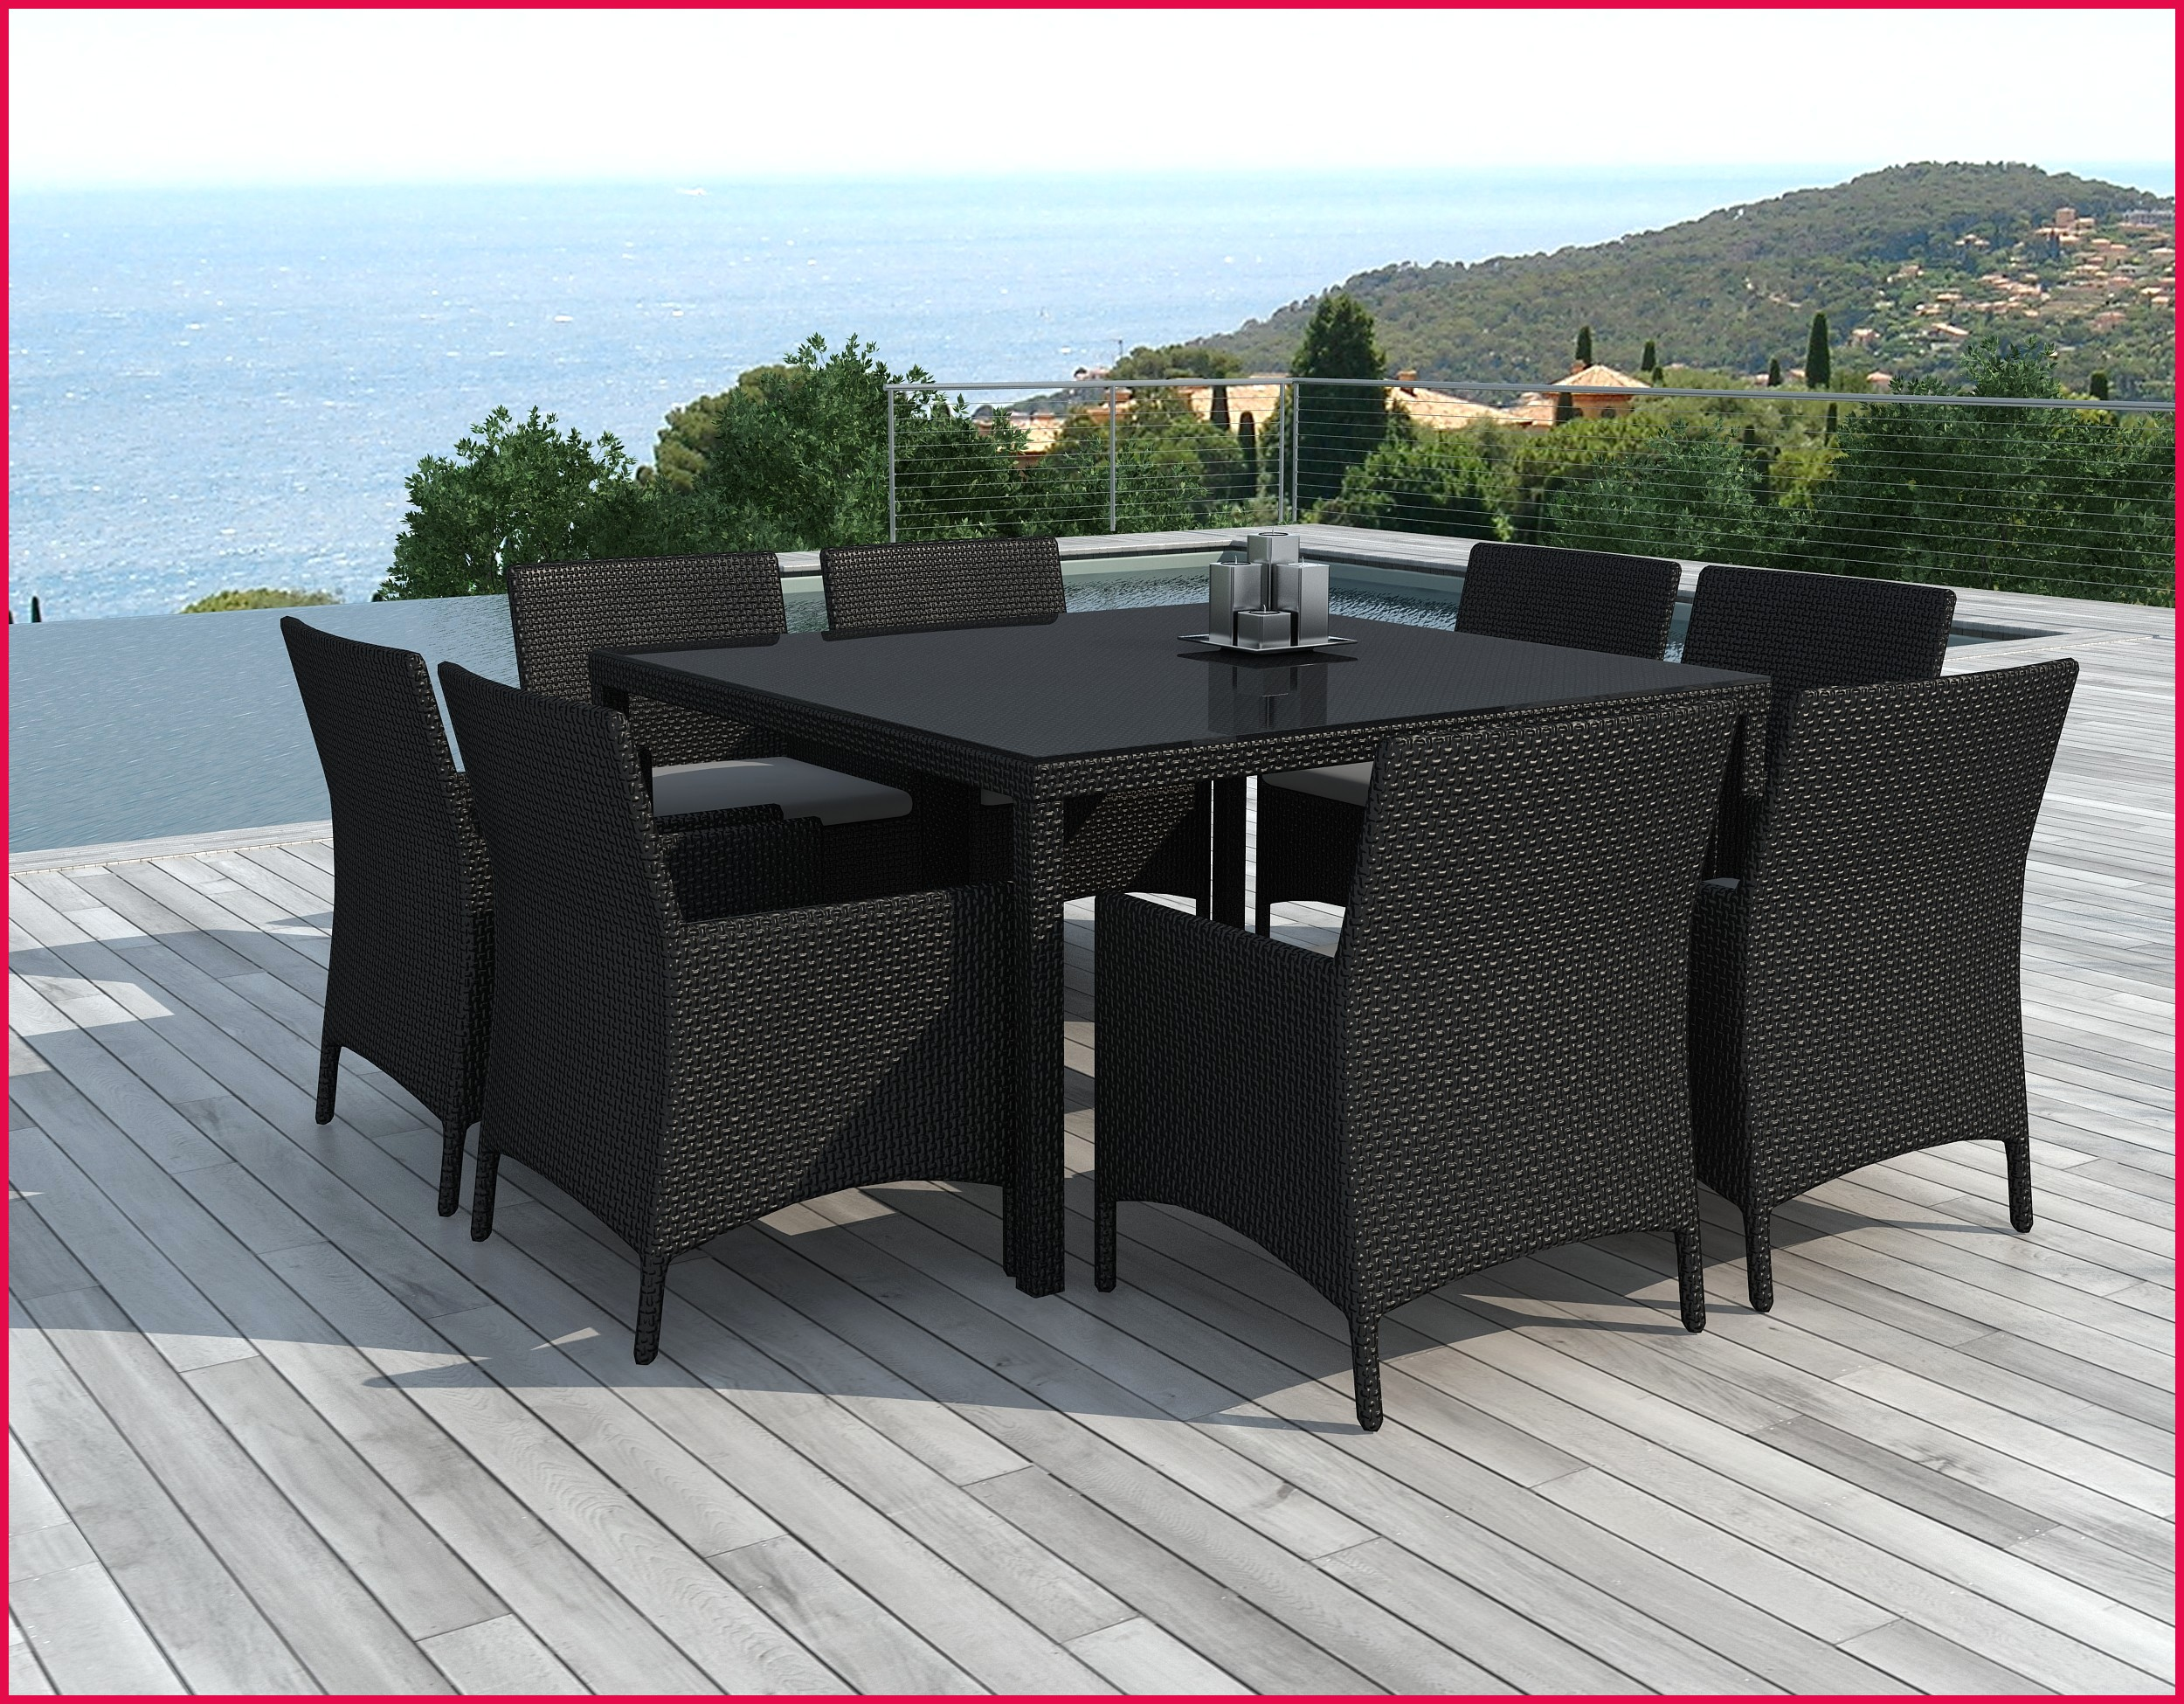 chaise pour terrasse luxe table et chaise pour terrasse pas cher de chaise pour terrasse